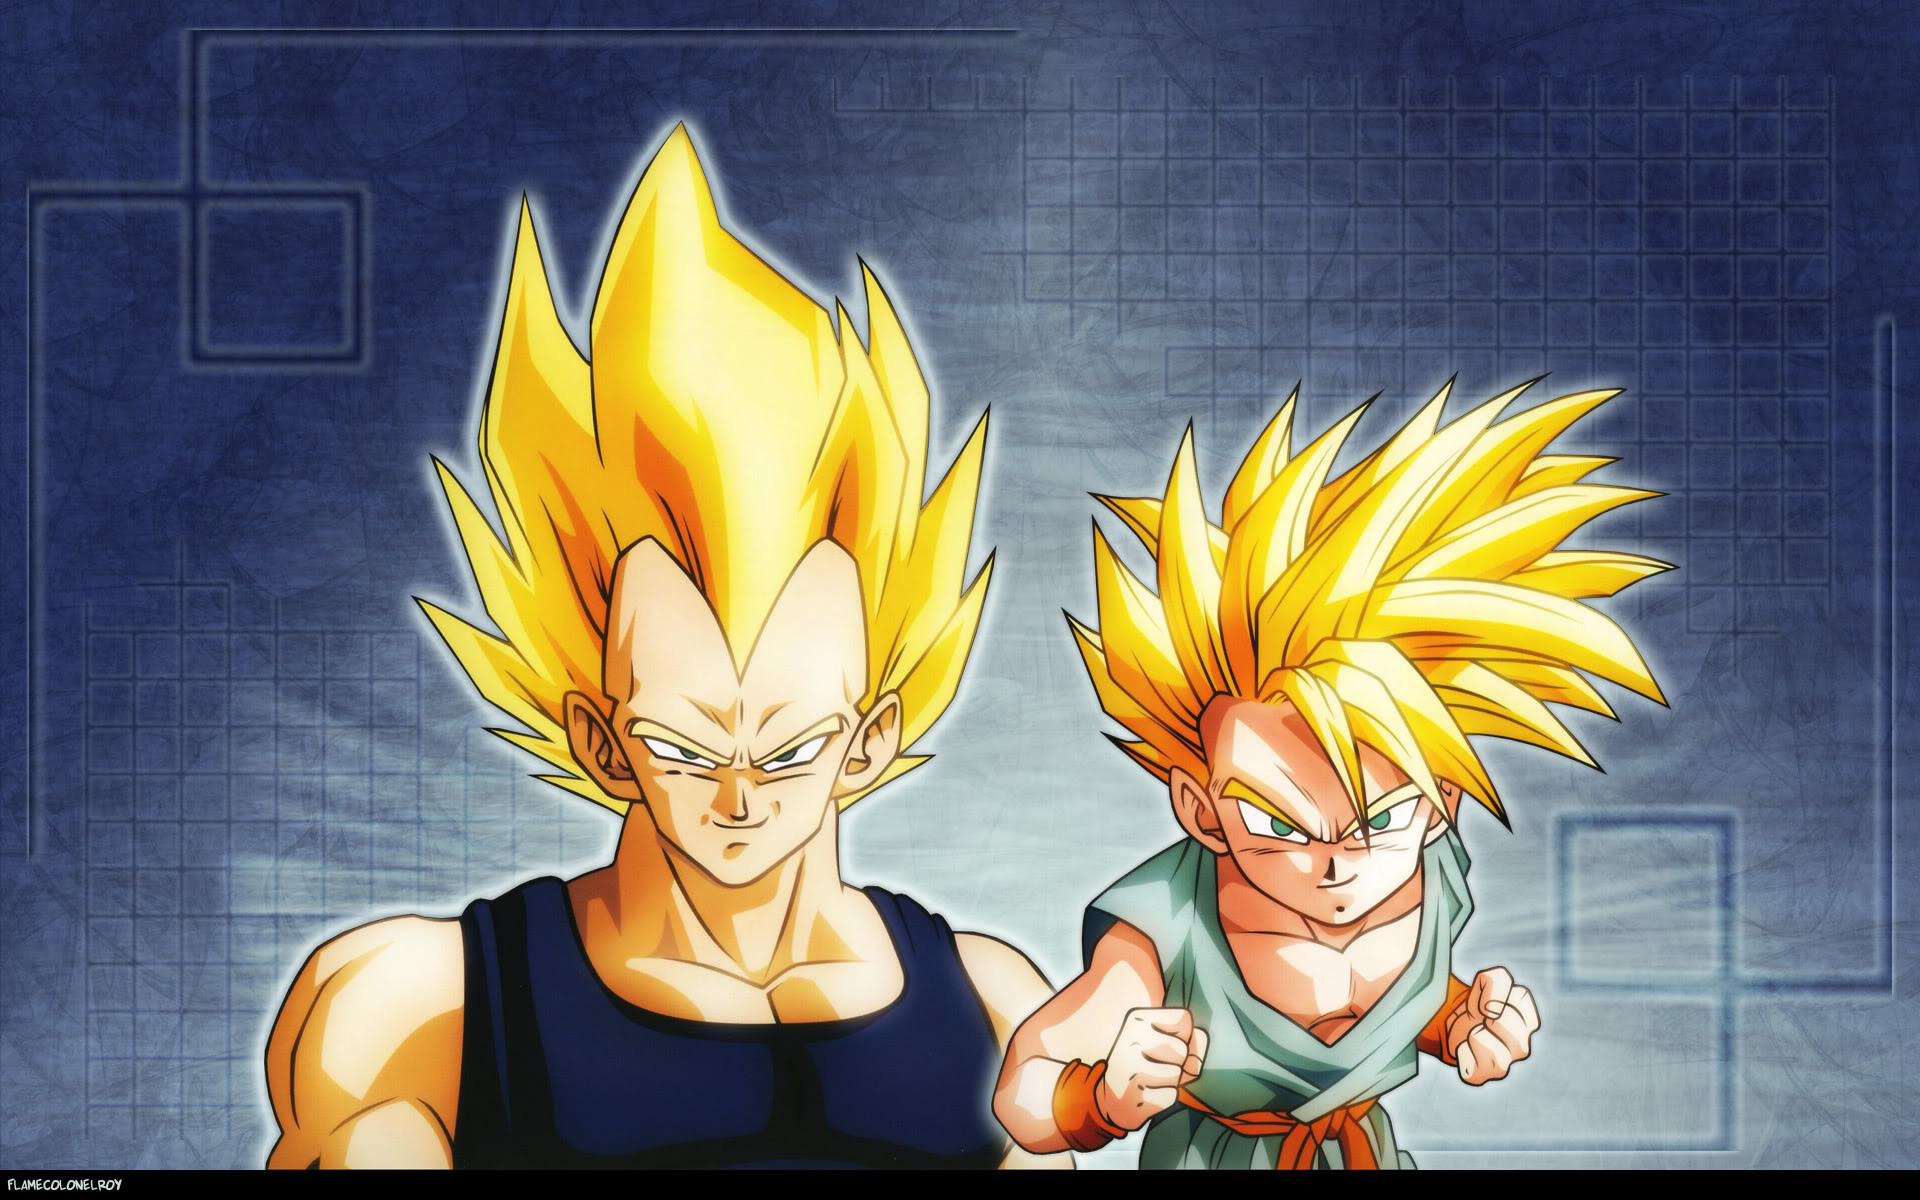 Wallpapers de Dragon Ball Z [Megapost!] – Taringa!